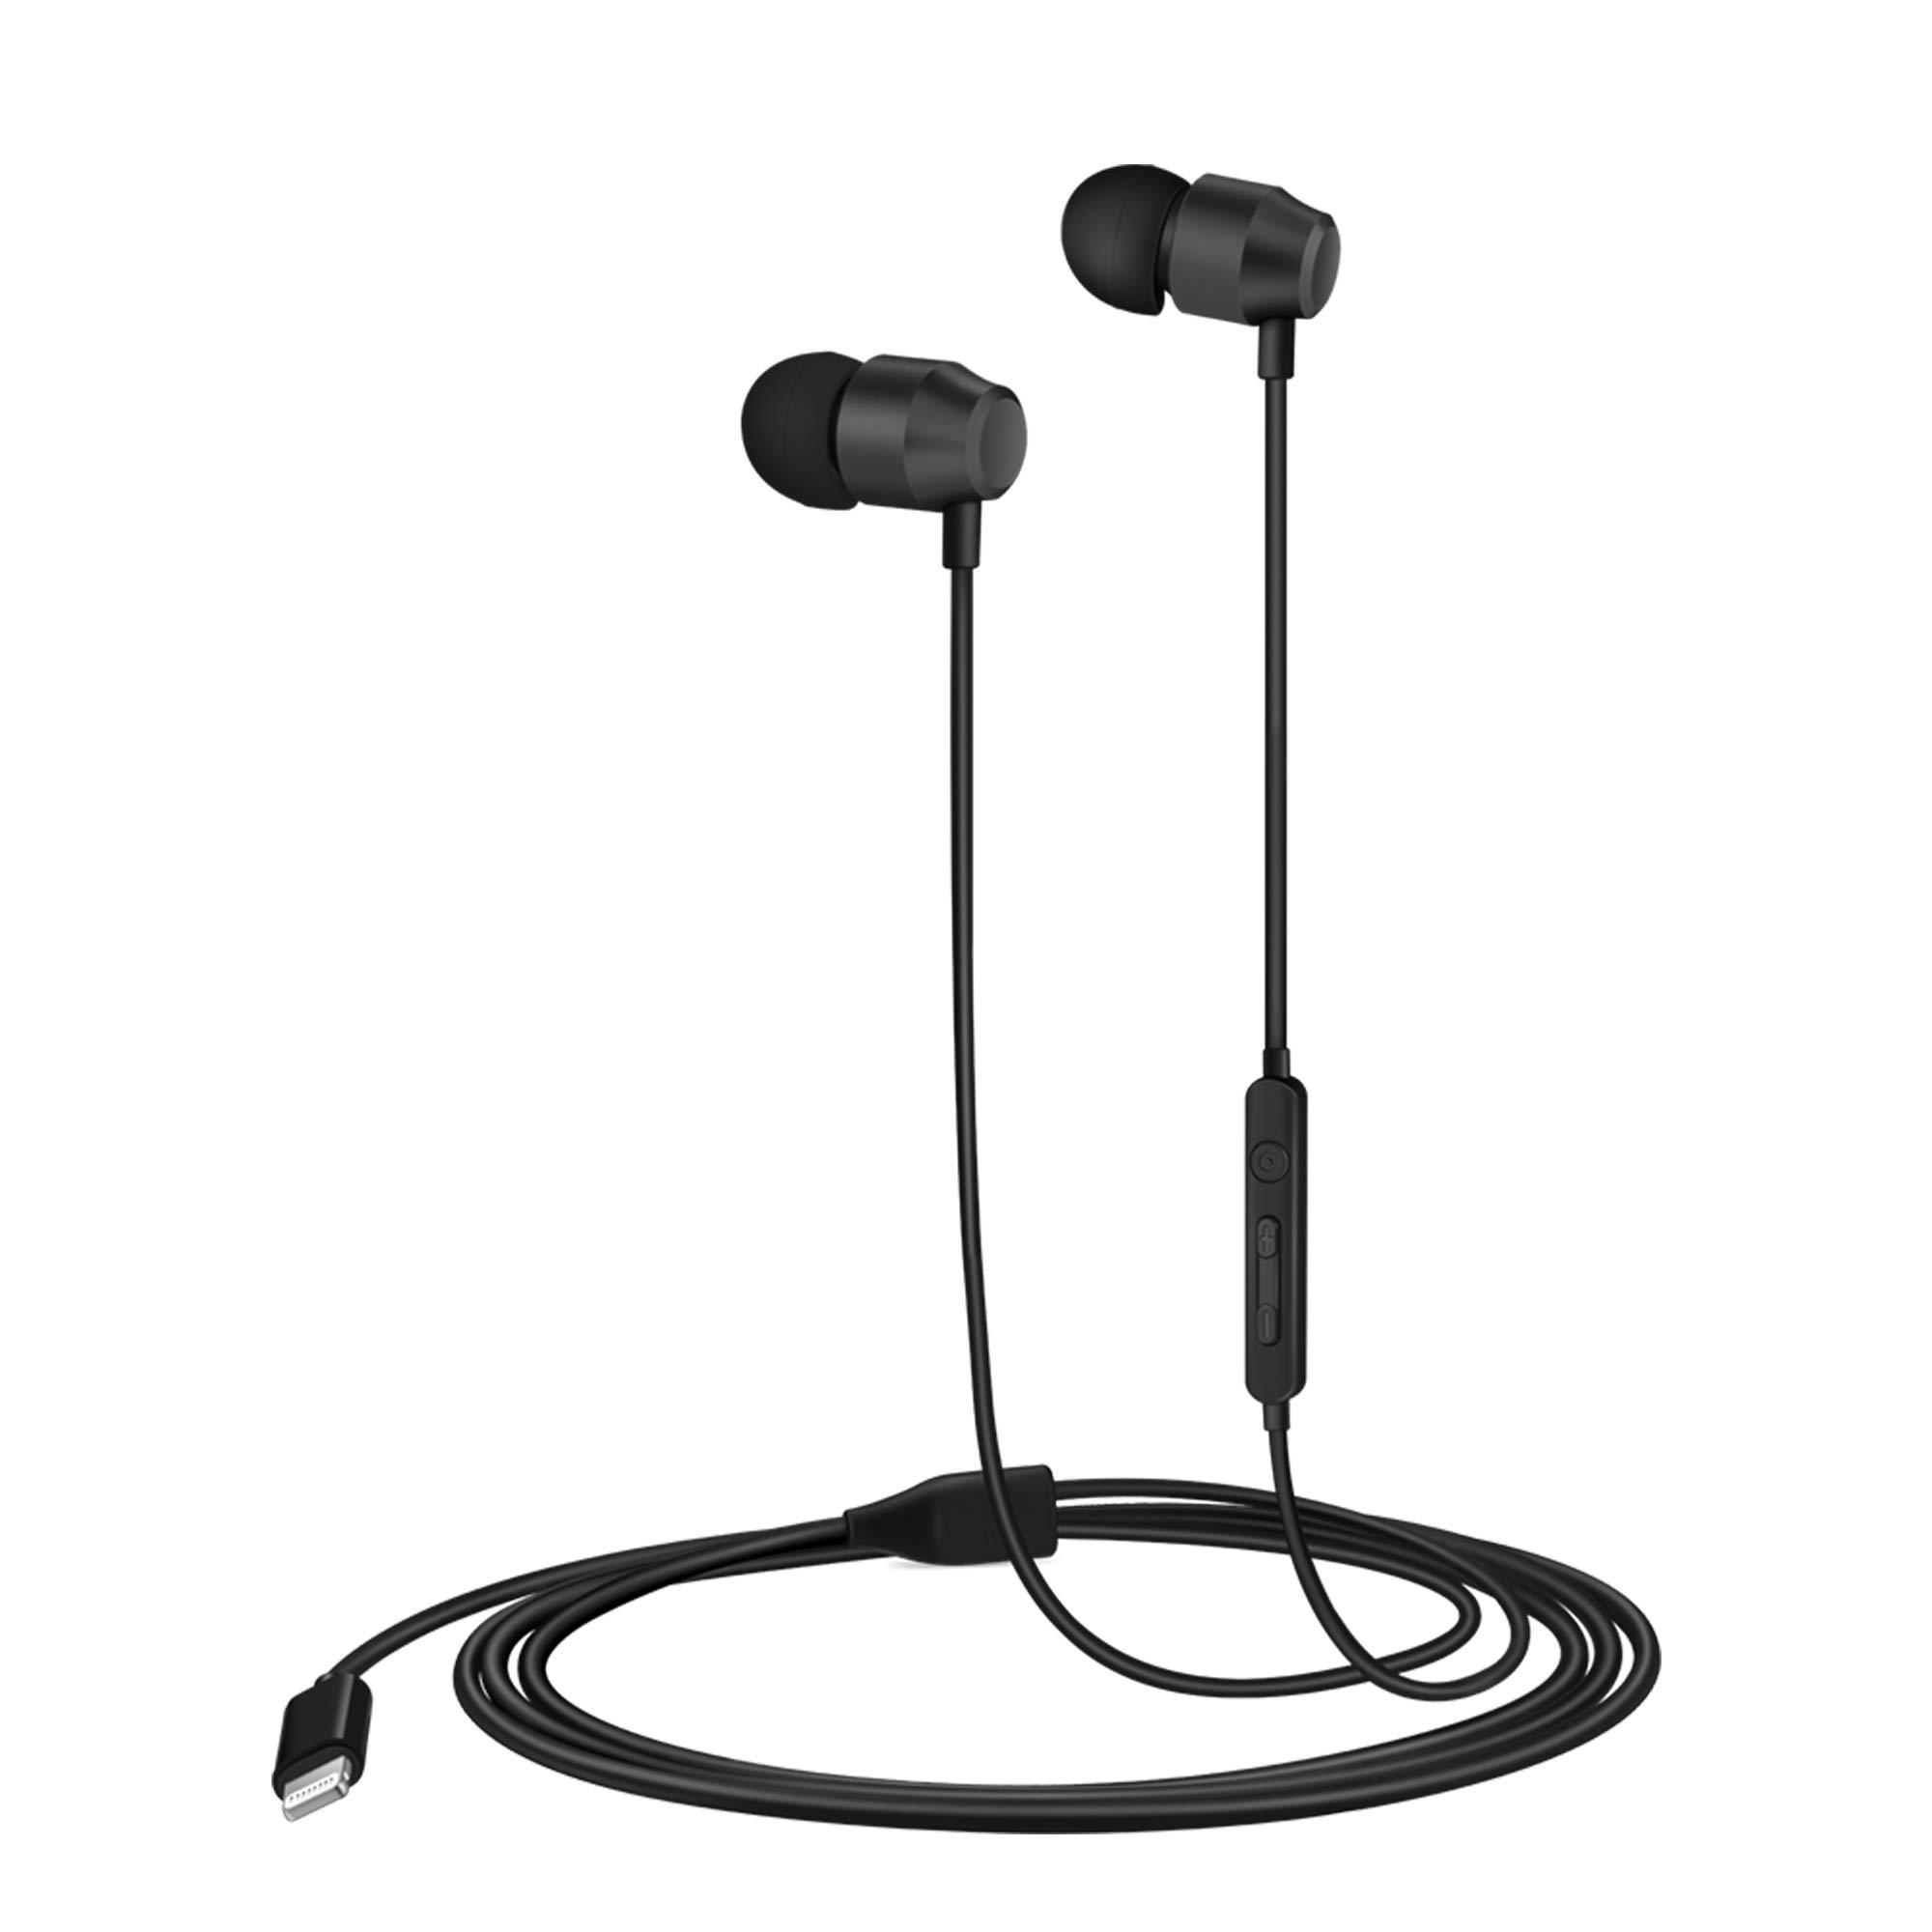 PALOVUE Earflow in-Ear Lightning Headphone Magnetic Earphone MFi Certified Earbuds with Microphone Controller Compatible iPhone X iPhone 8/P iPhone 7/P (Metallic Black) by PALOVUE